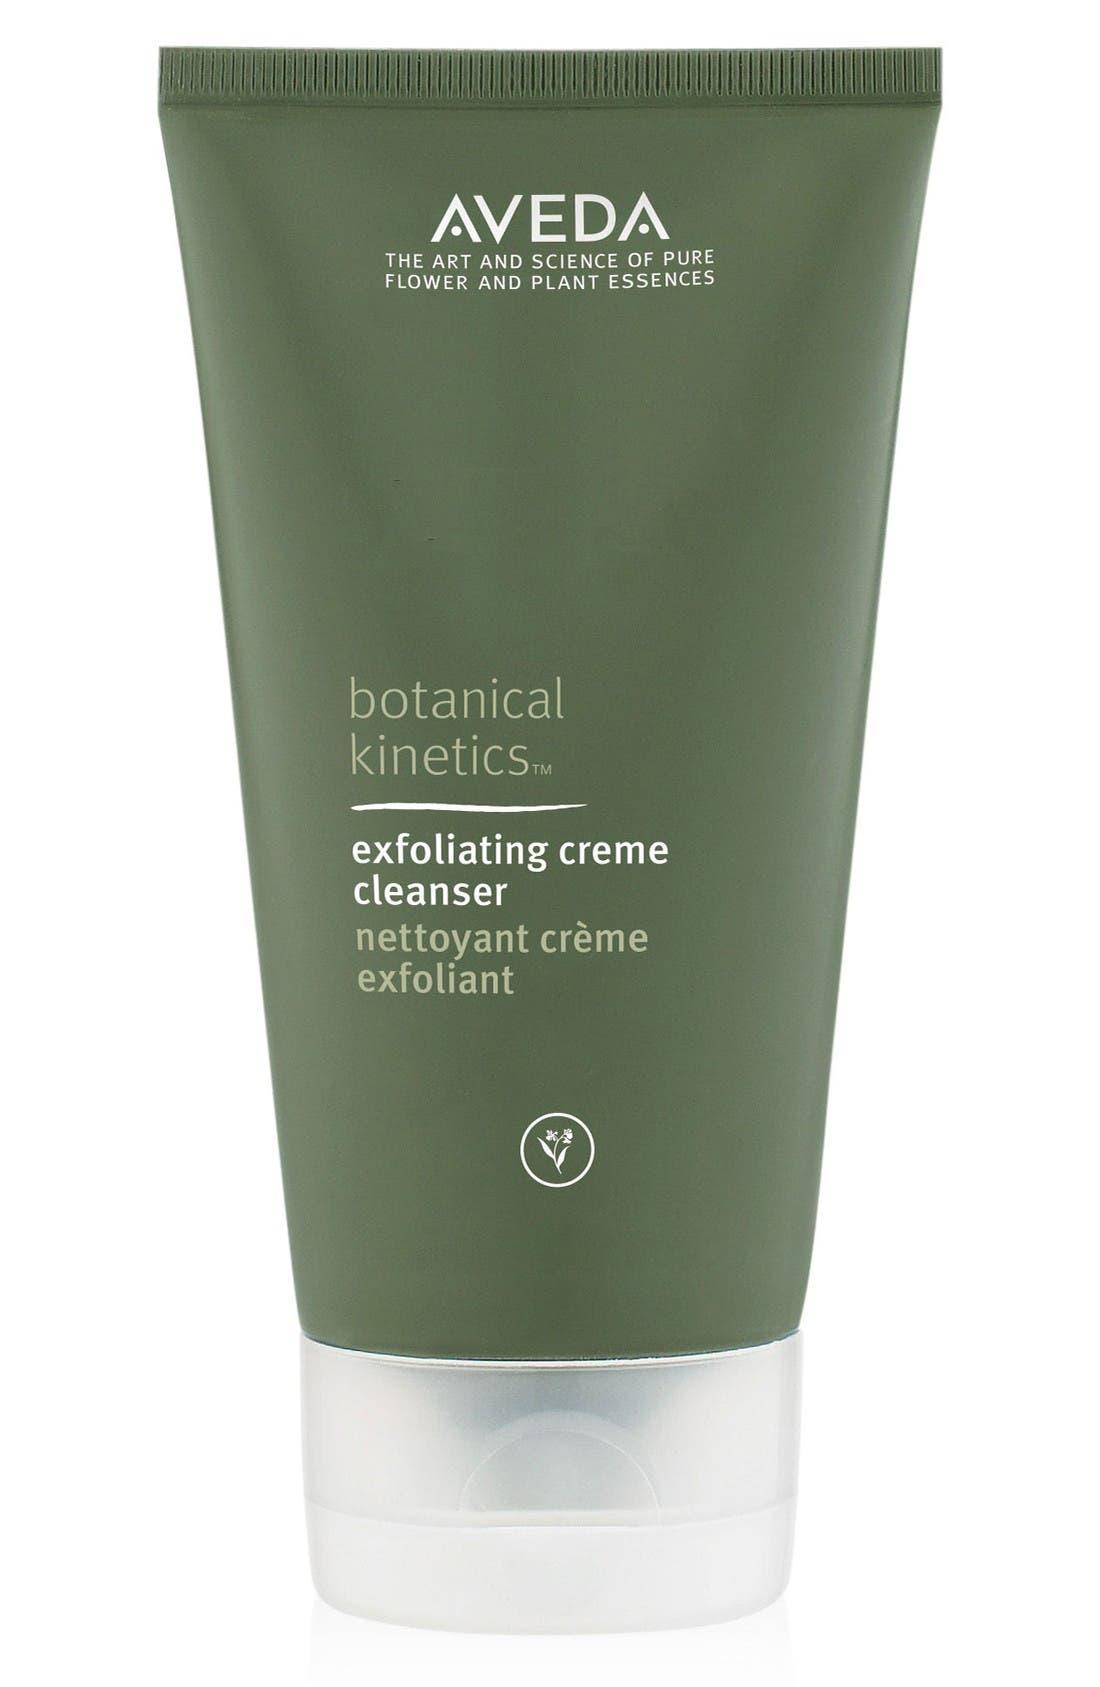 Aveda botanical kinetics™ Exfoliating Creme Cleanser